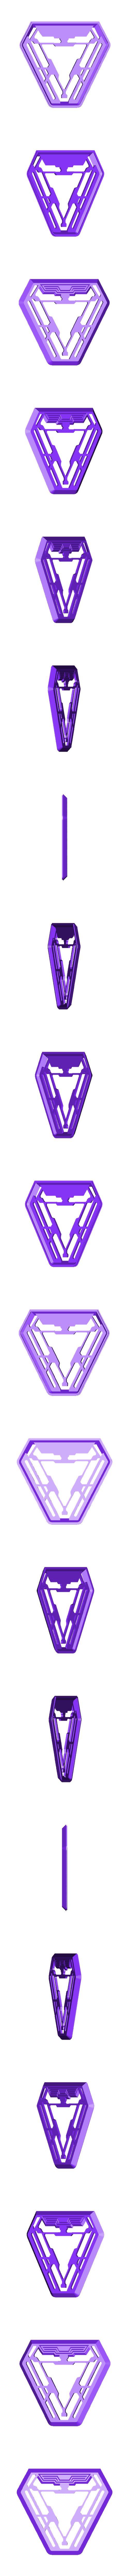 Reactor_Frame.STL Download free STL file Arc Reactor Display • 3D printable design, yelelabs